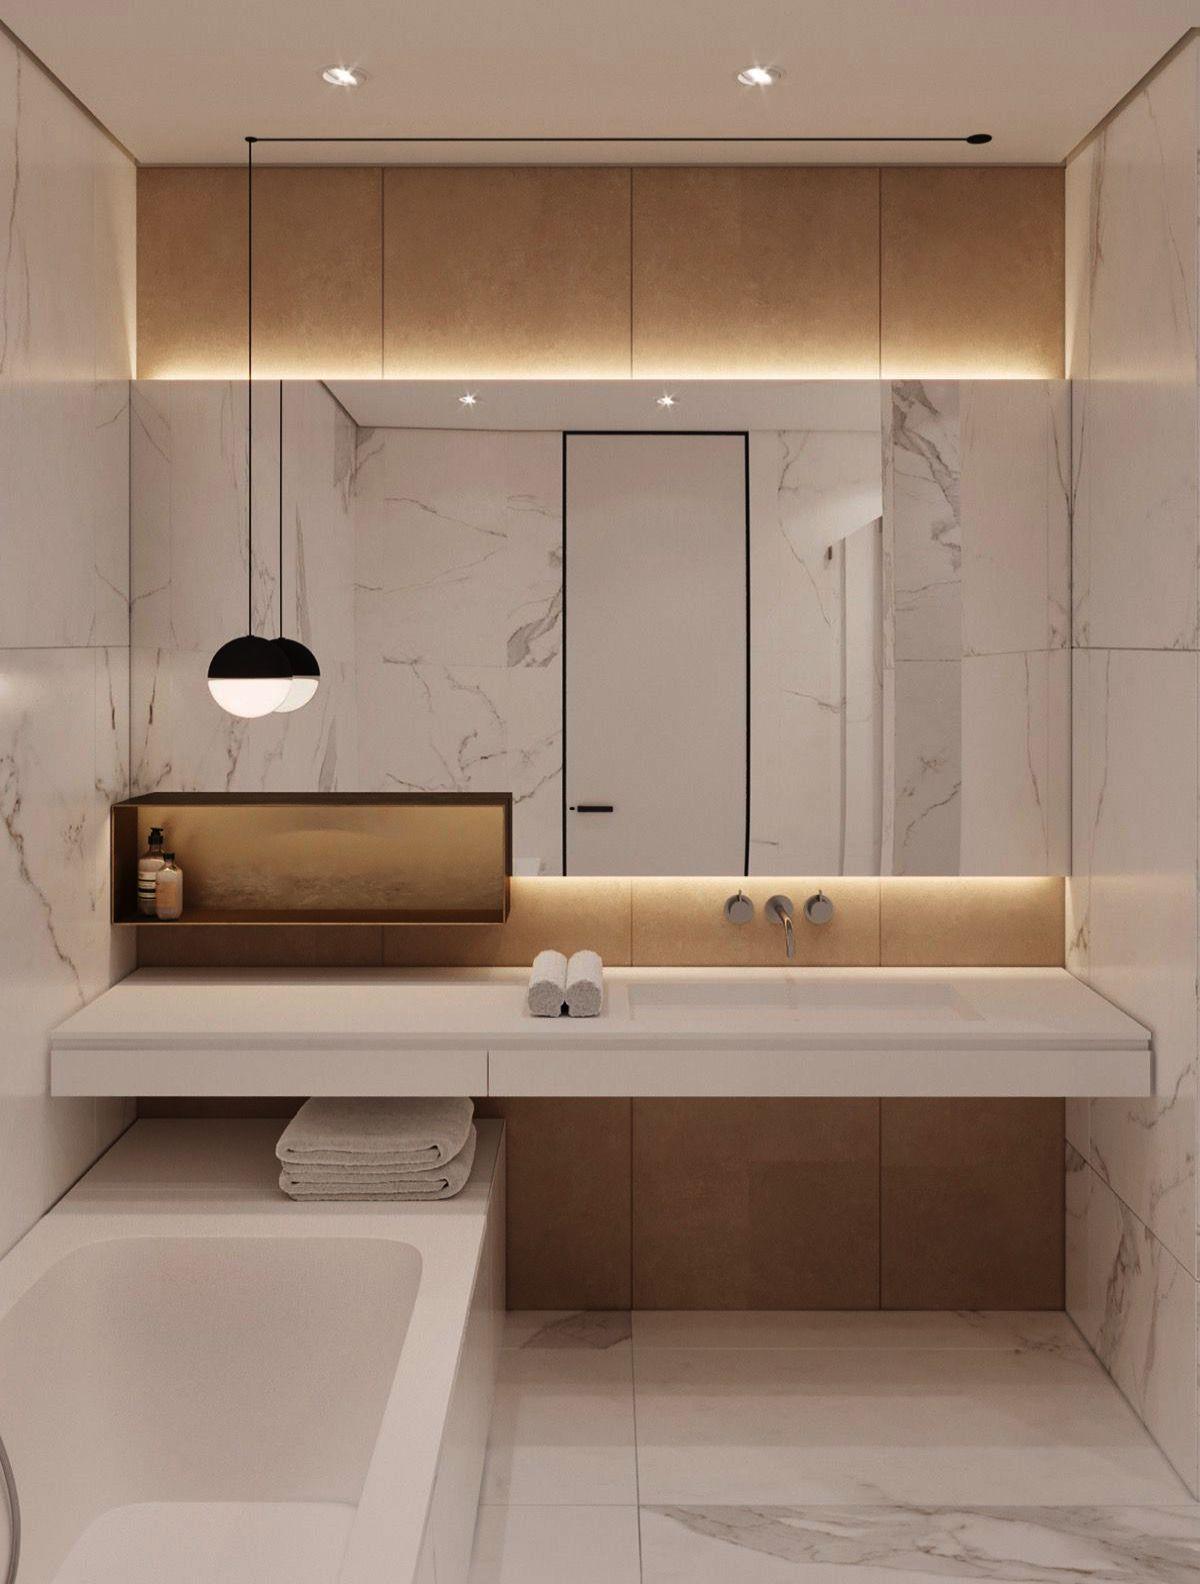 Bathroom Decor On Pinterest Following Bathroom Mirrors Edmonton Only Bathroom Mirrors Frameless Top Bathroom Design Modern Bathroom Design Bathroom Design